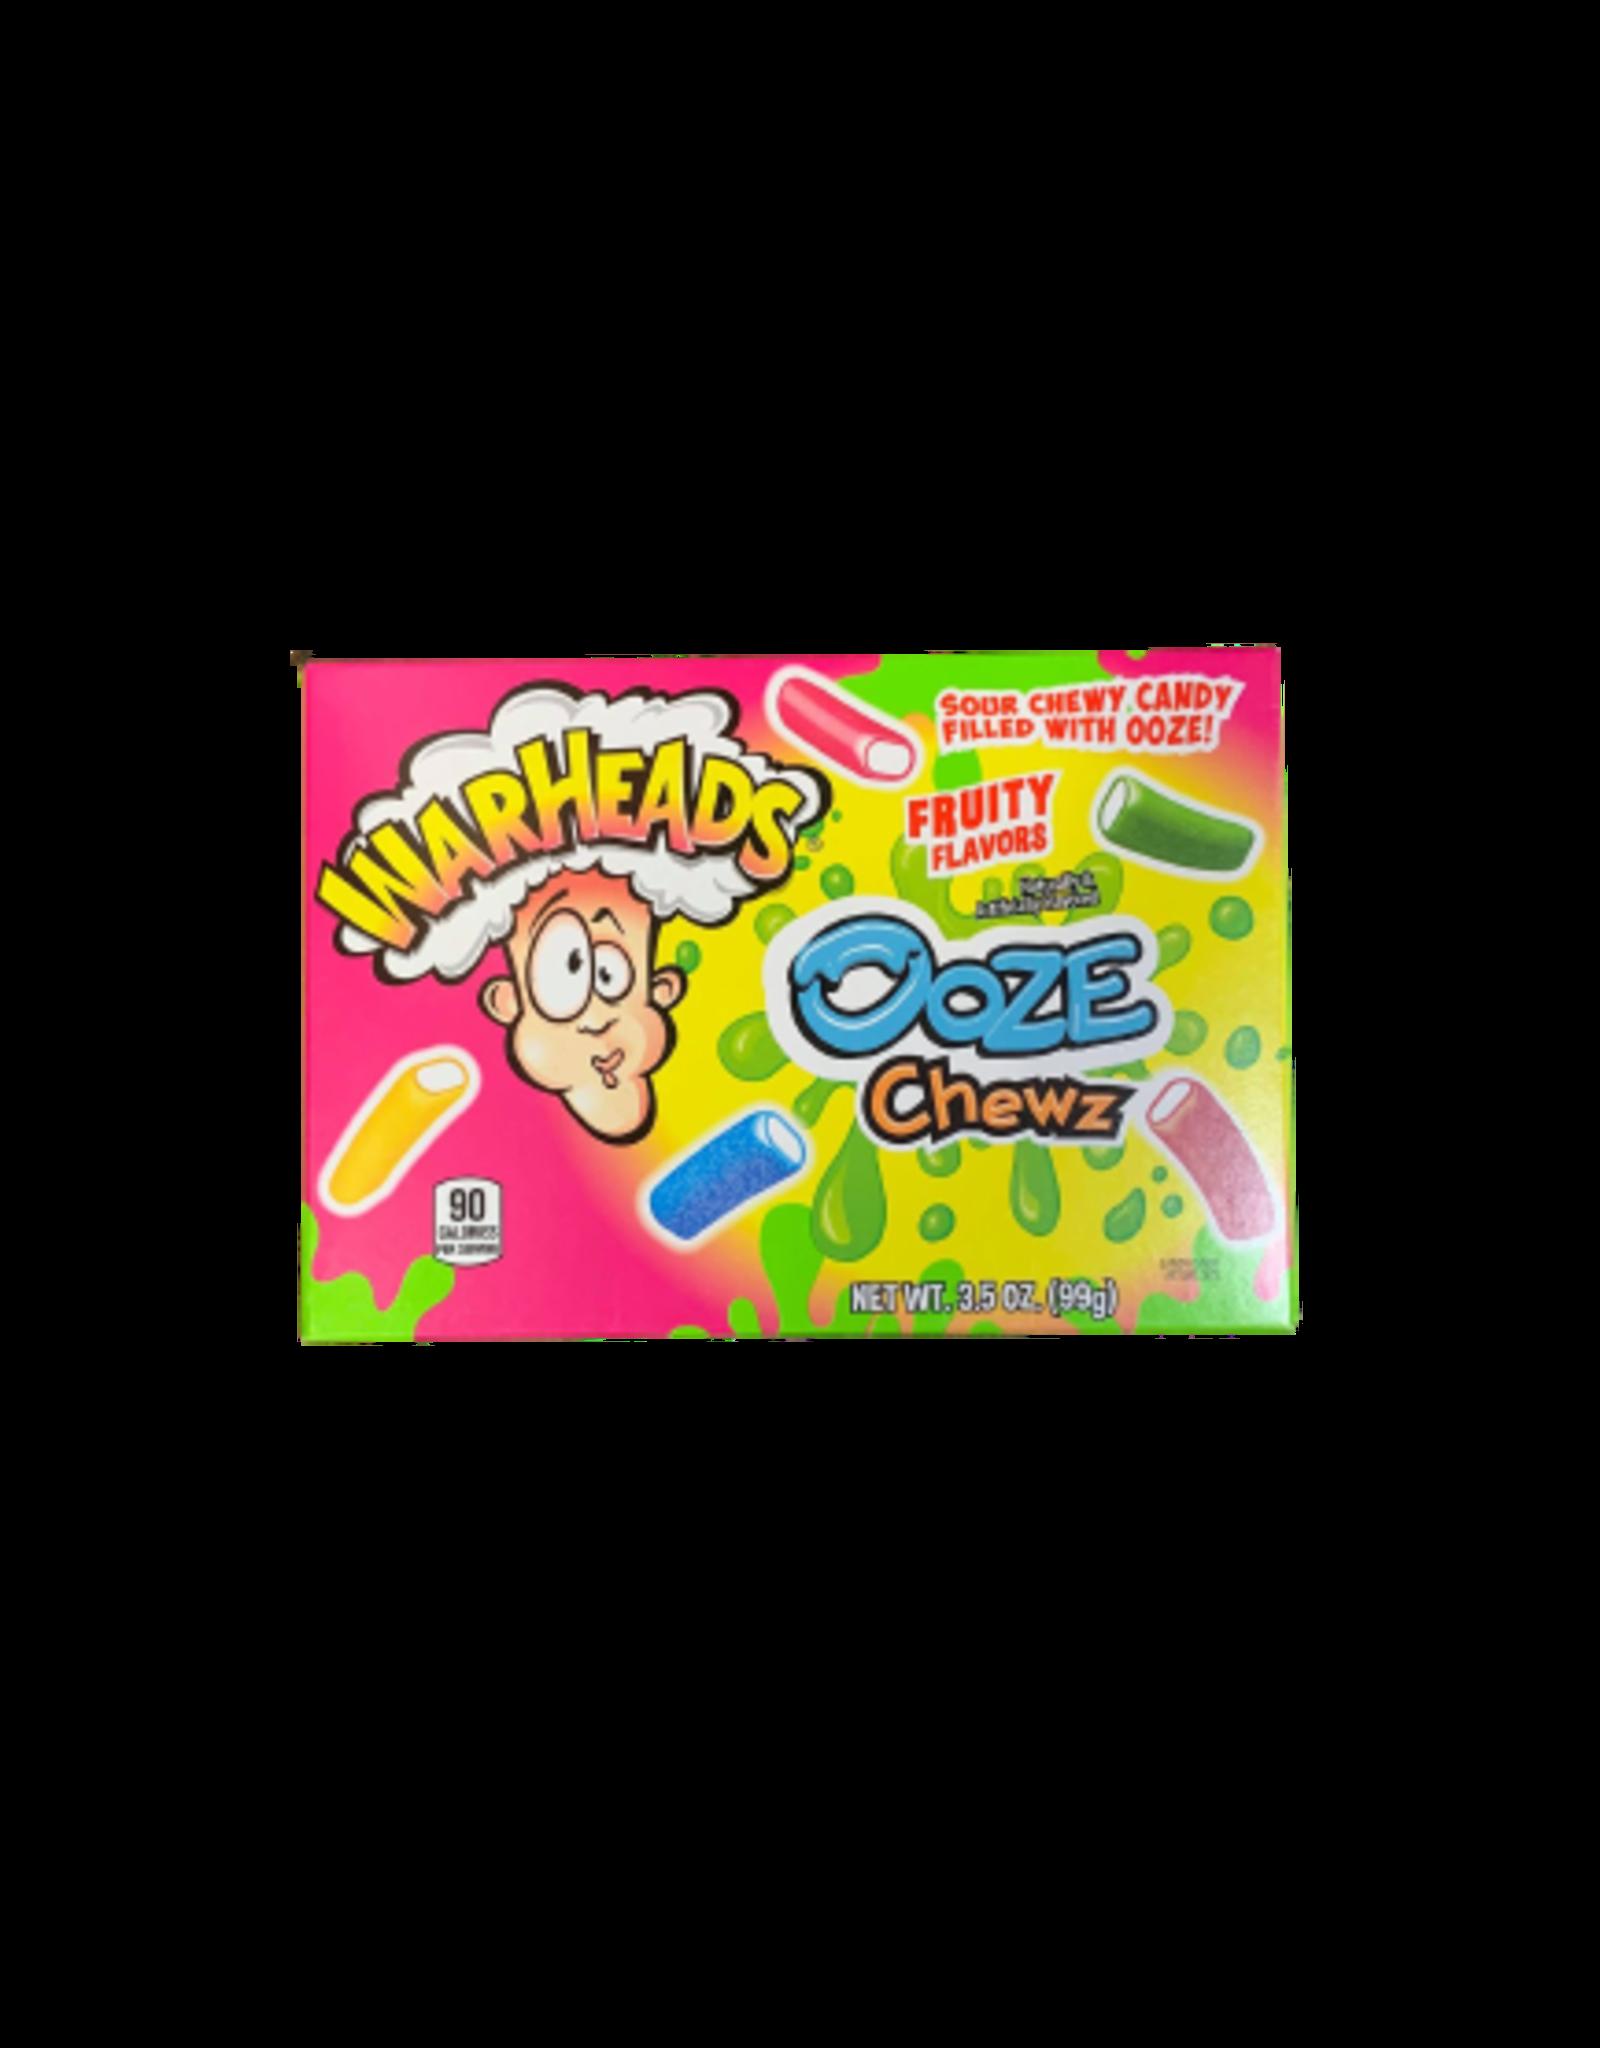 Warheads Ooze Chew